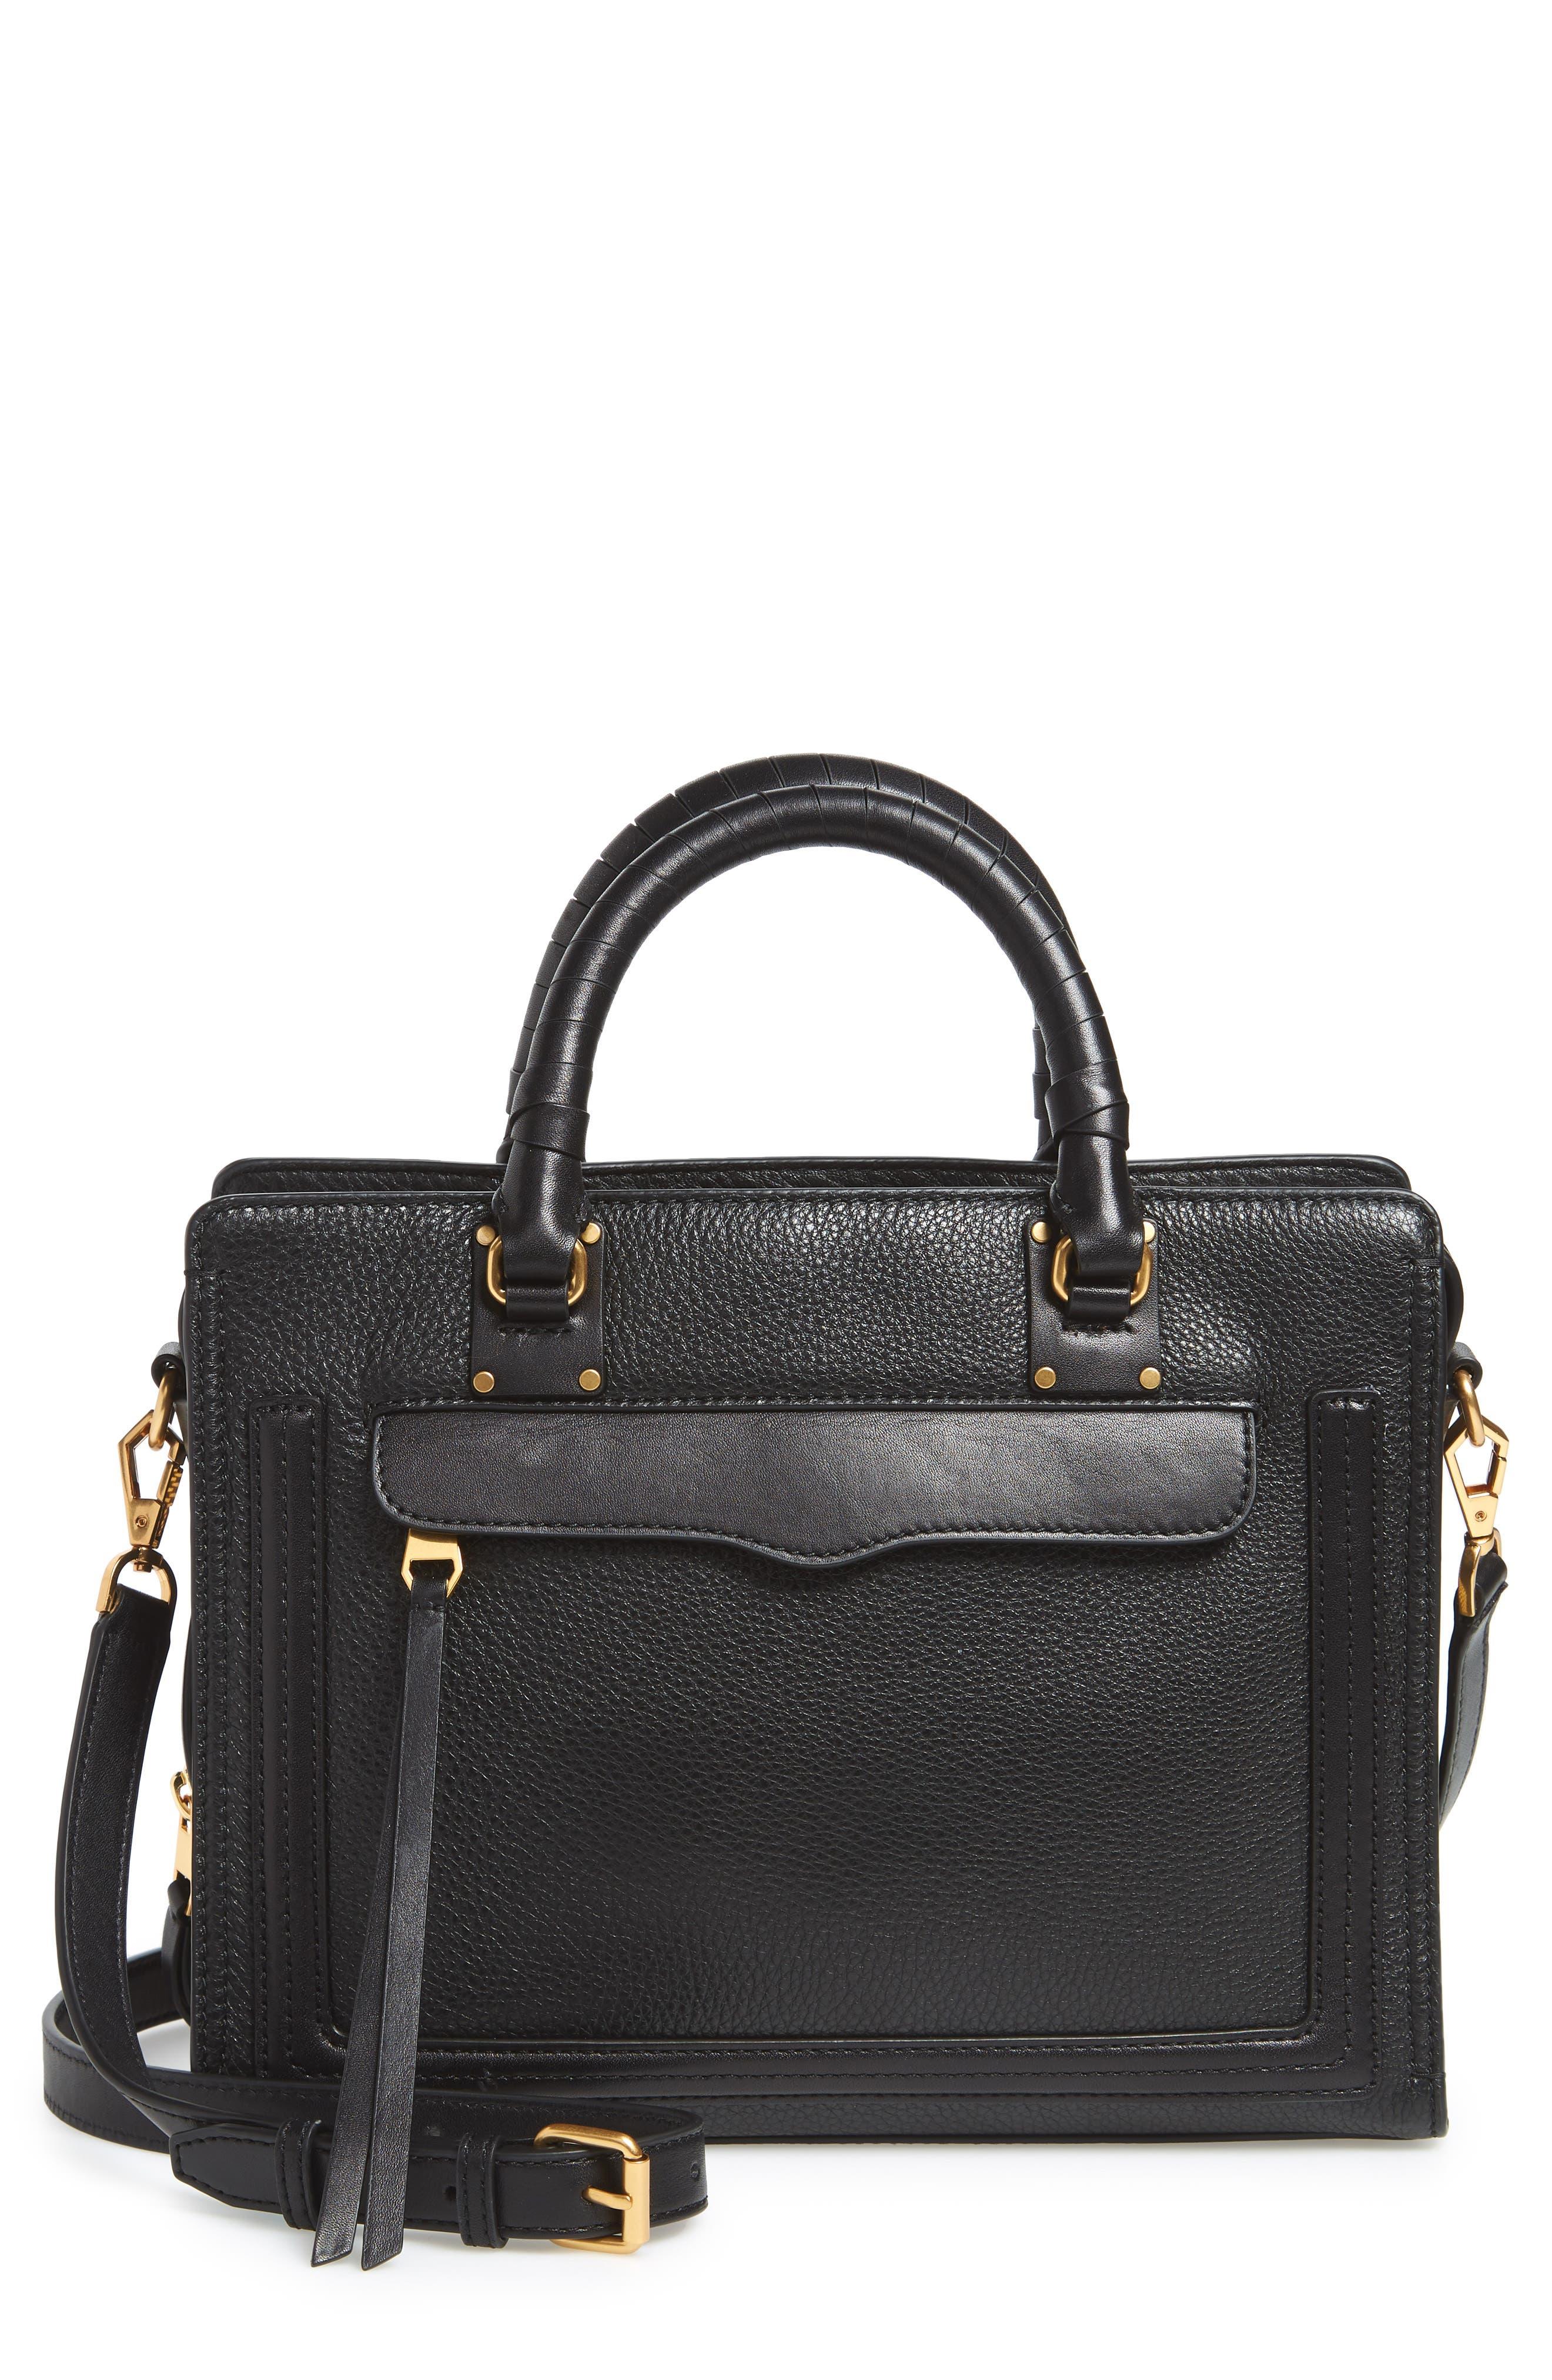 Medium Bree Leather Satchel,                         Main,                         color, 001